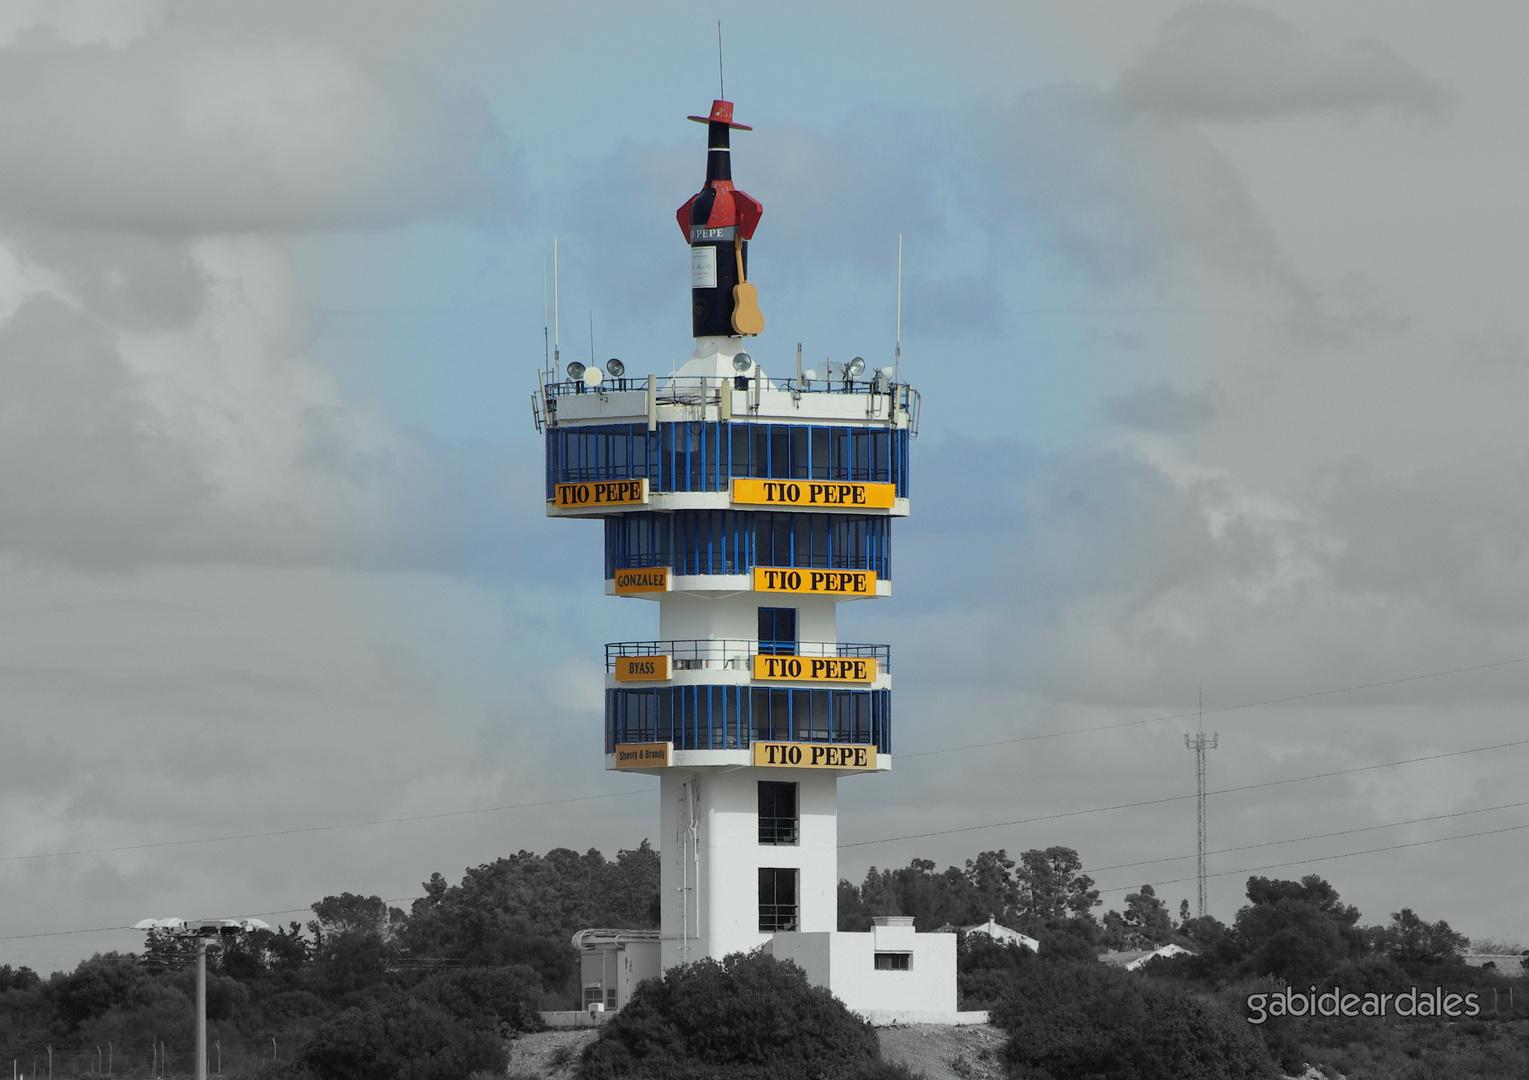 La Torre Tio Pepe.